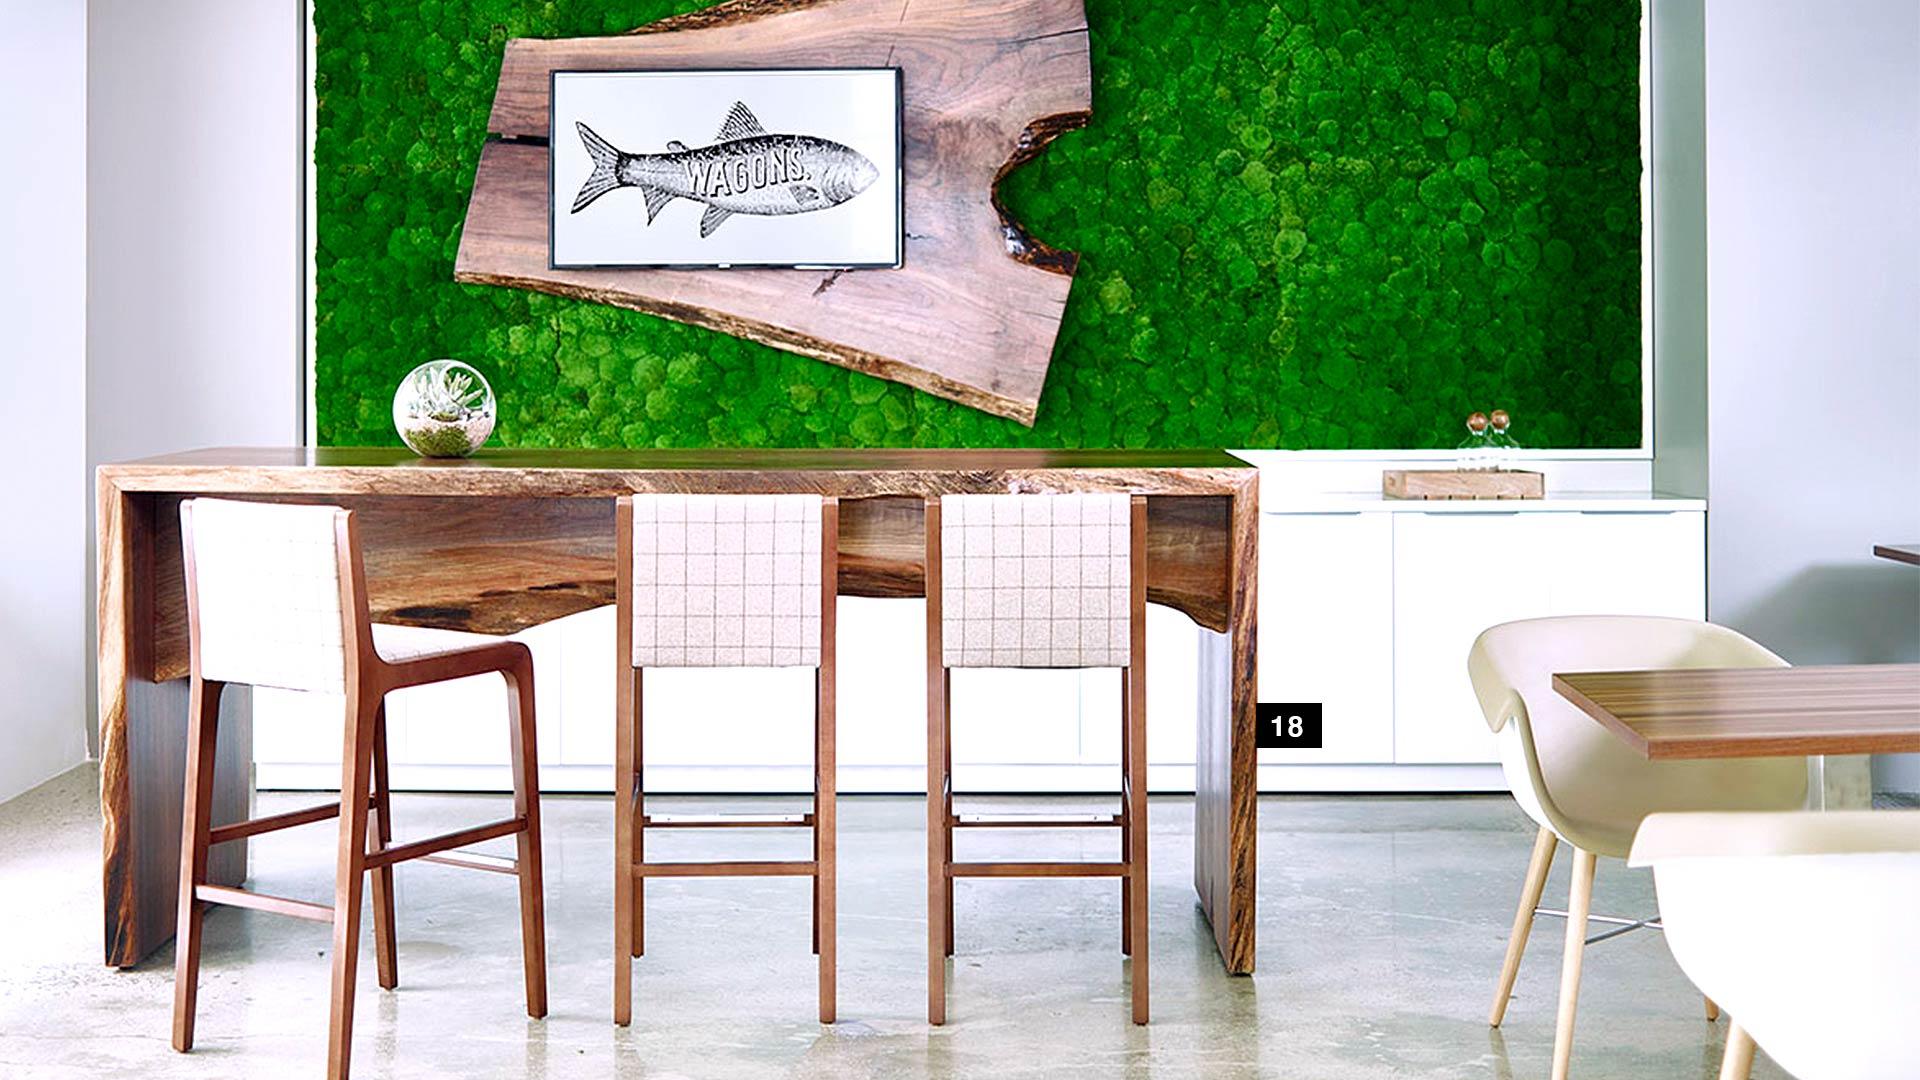 green-office-ofs-modello-stool